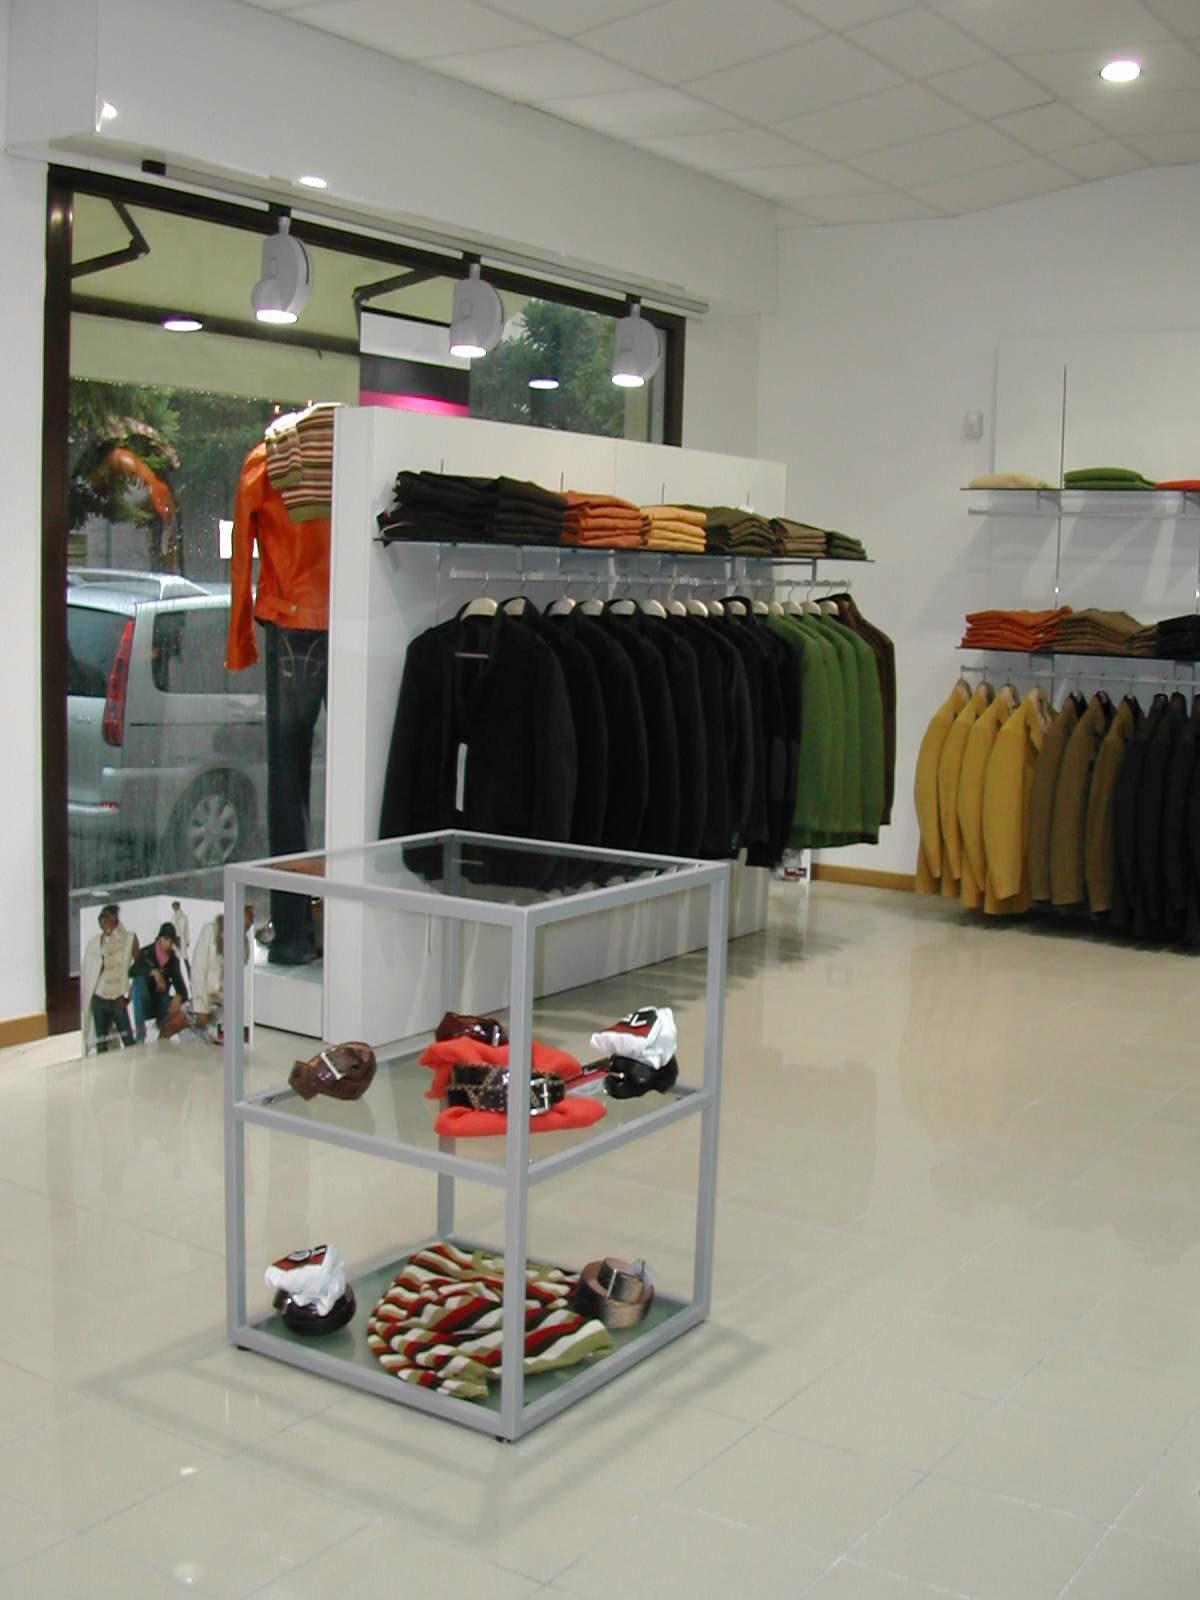 negozi arredamento toscana ~ gitsupport for . - Arredamento Negozi Abbigliamento Toscana